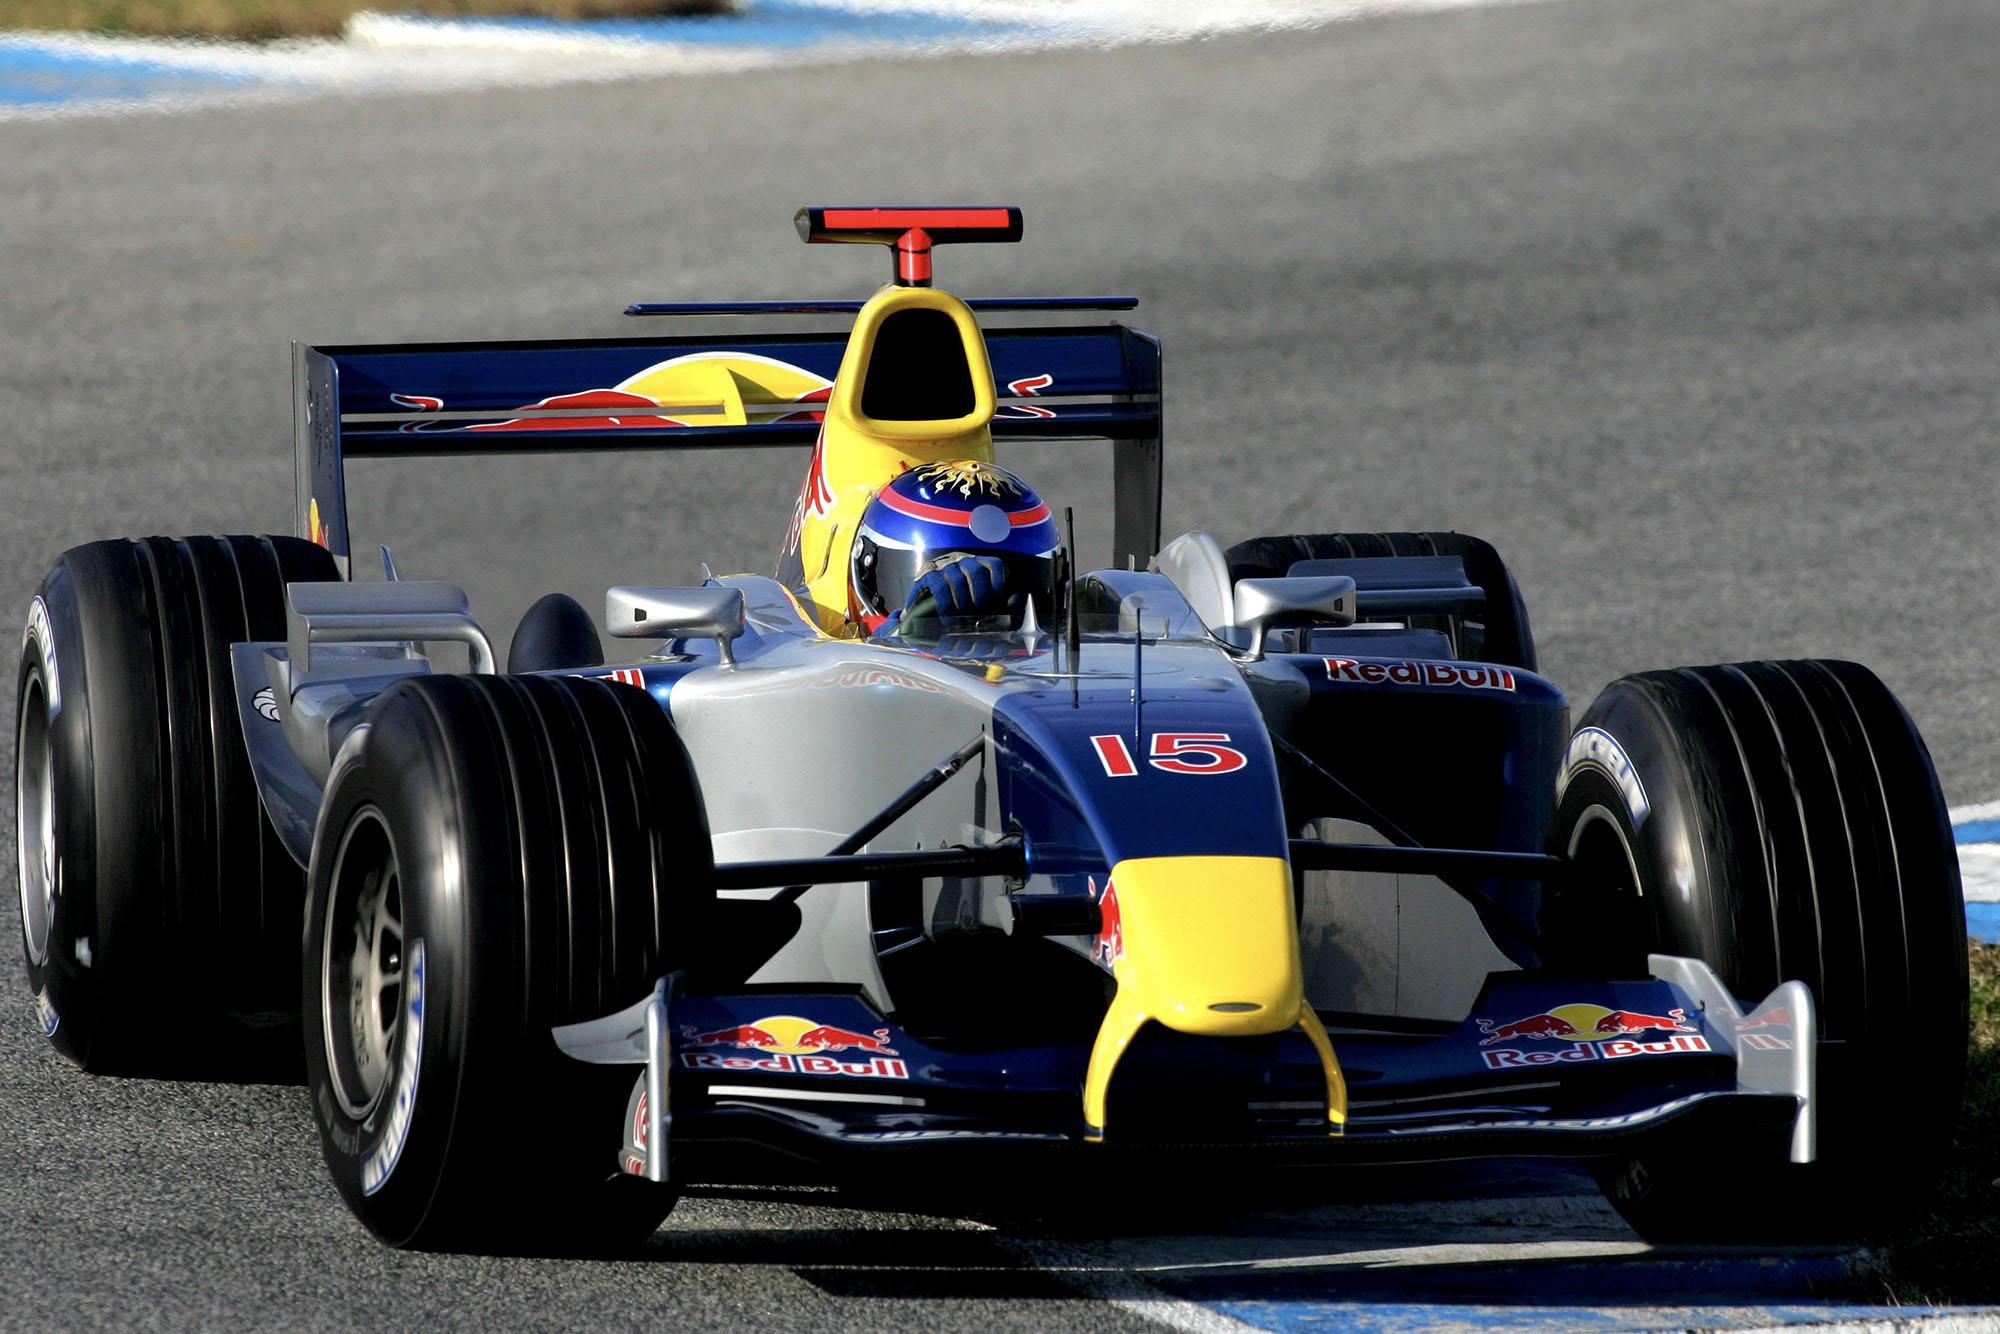 Neel Jani testing for Red Bull during 2004.